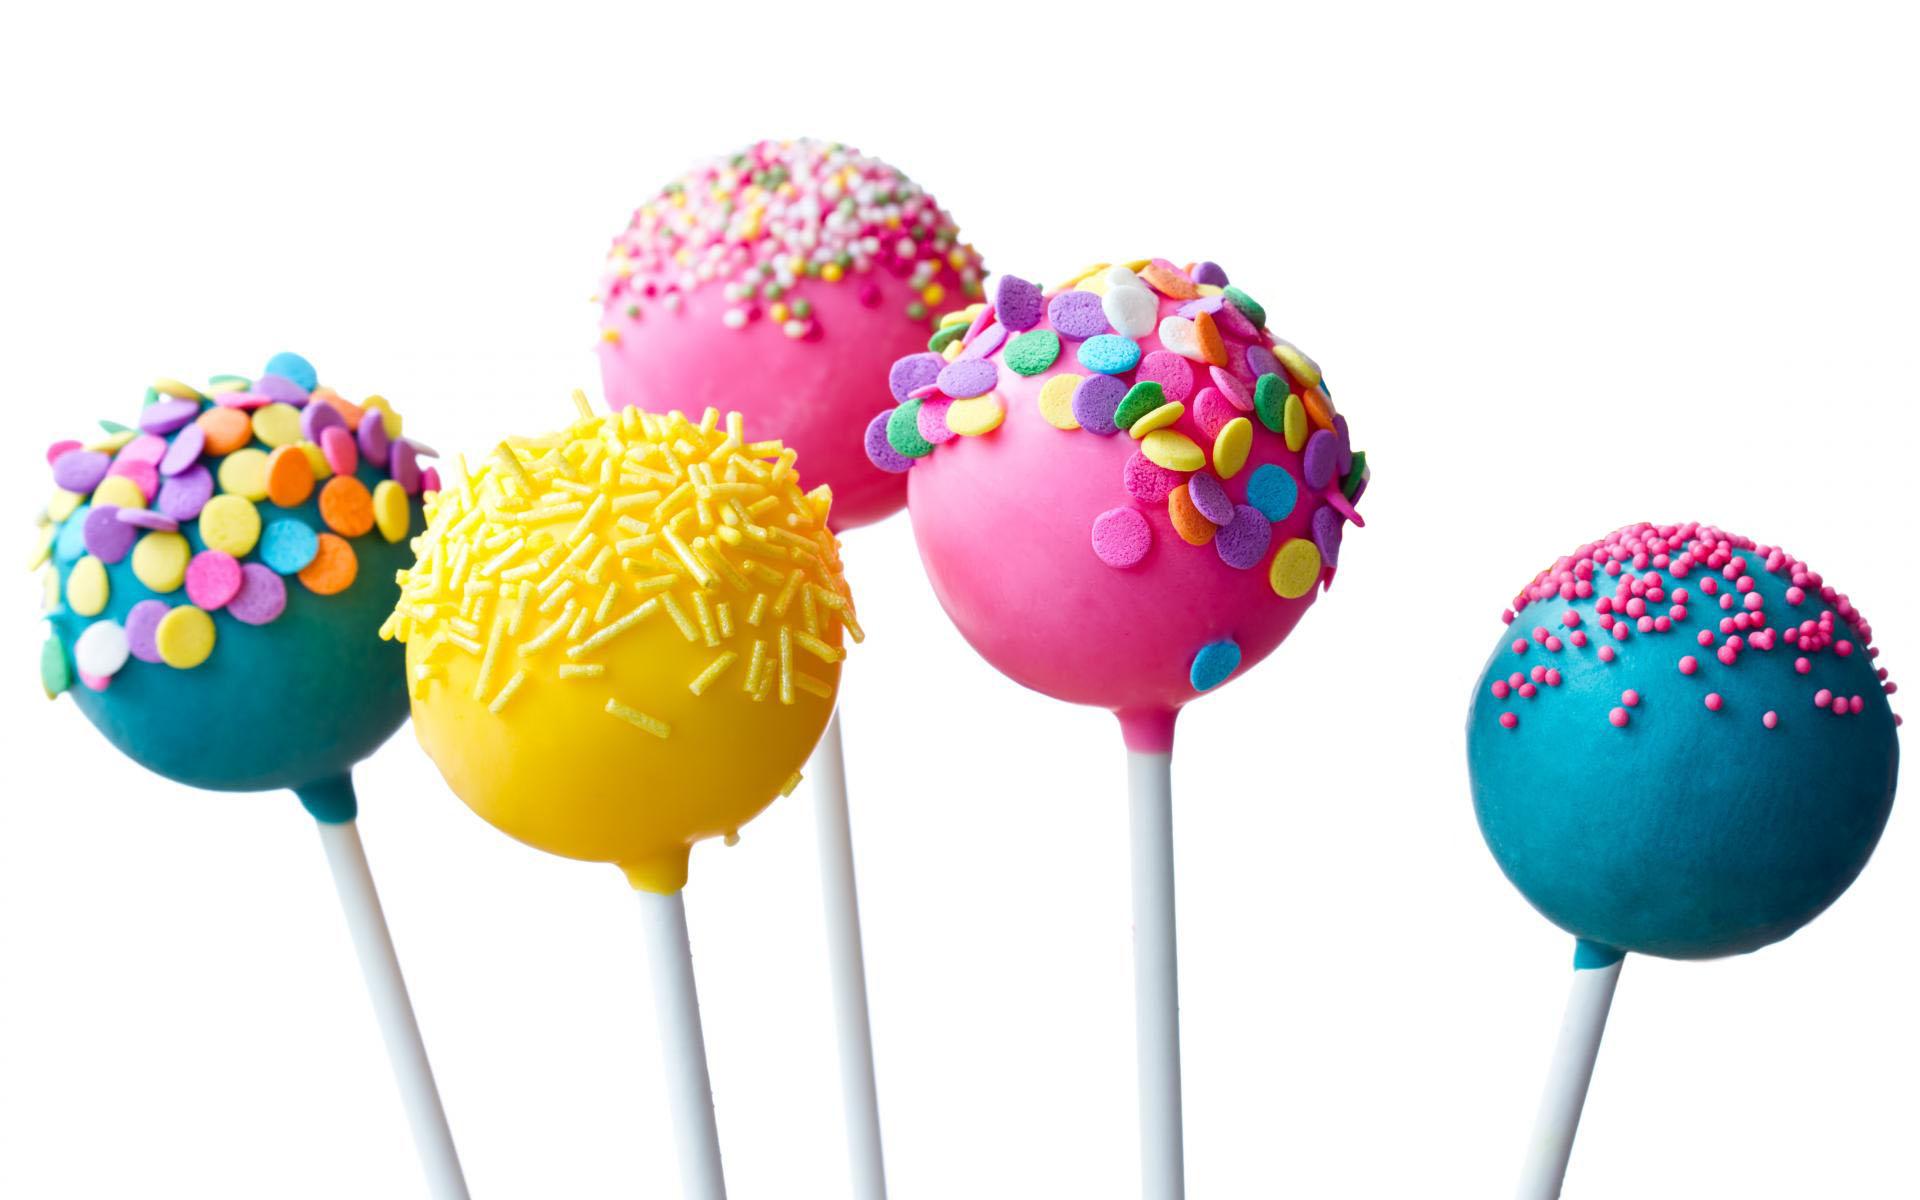 Colorful-Lollipop-Candies-HD-Wallpaper.jpg